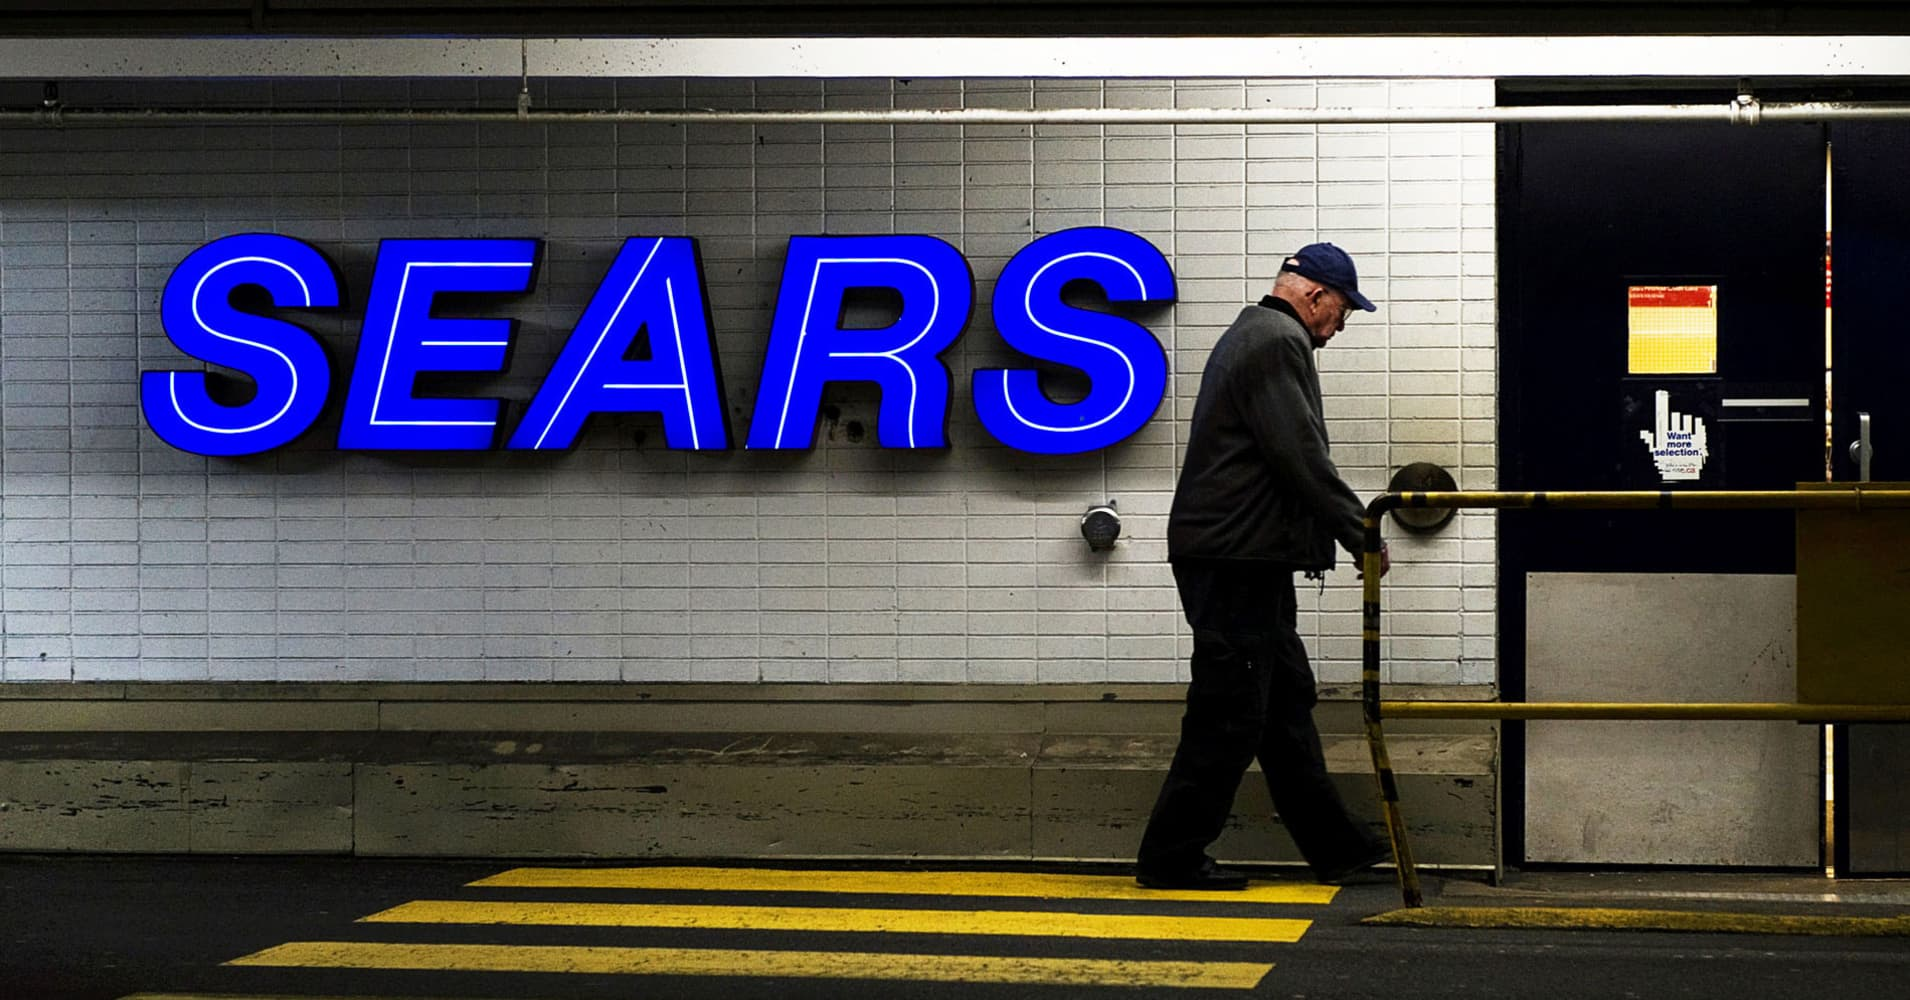 Sears Chairman Eddie Lampert submits $4.6 billion proposal to save Sears